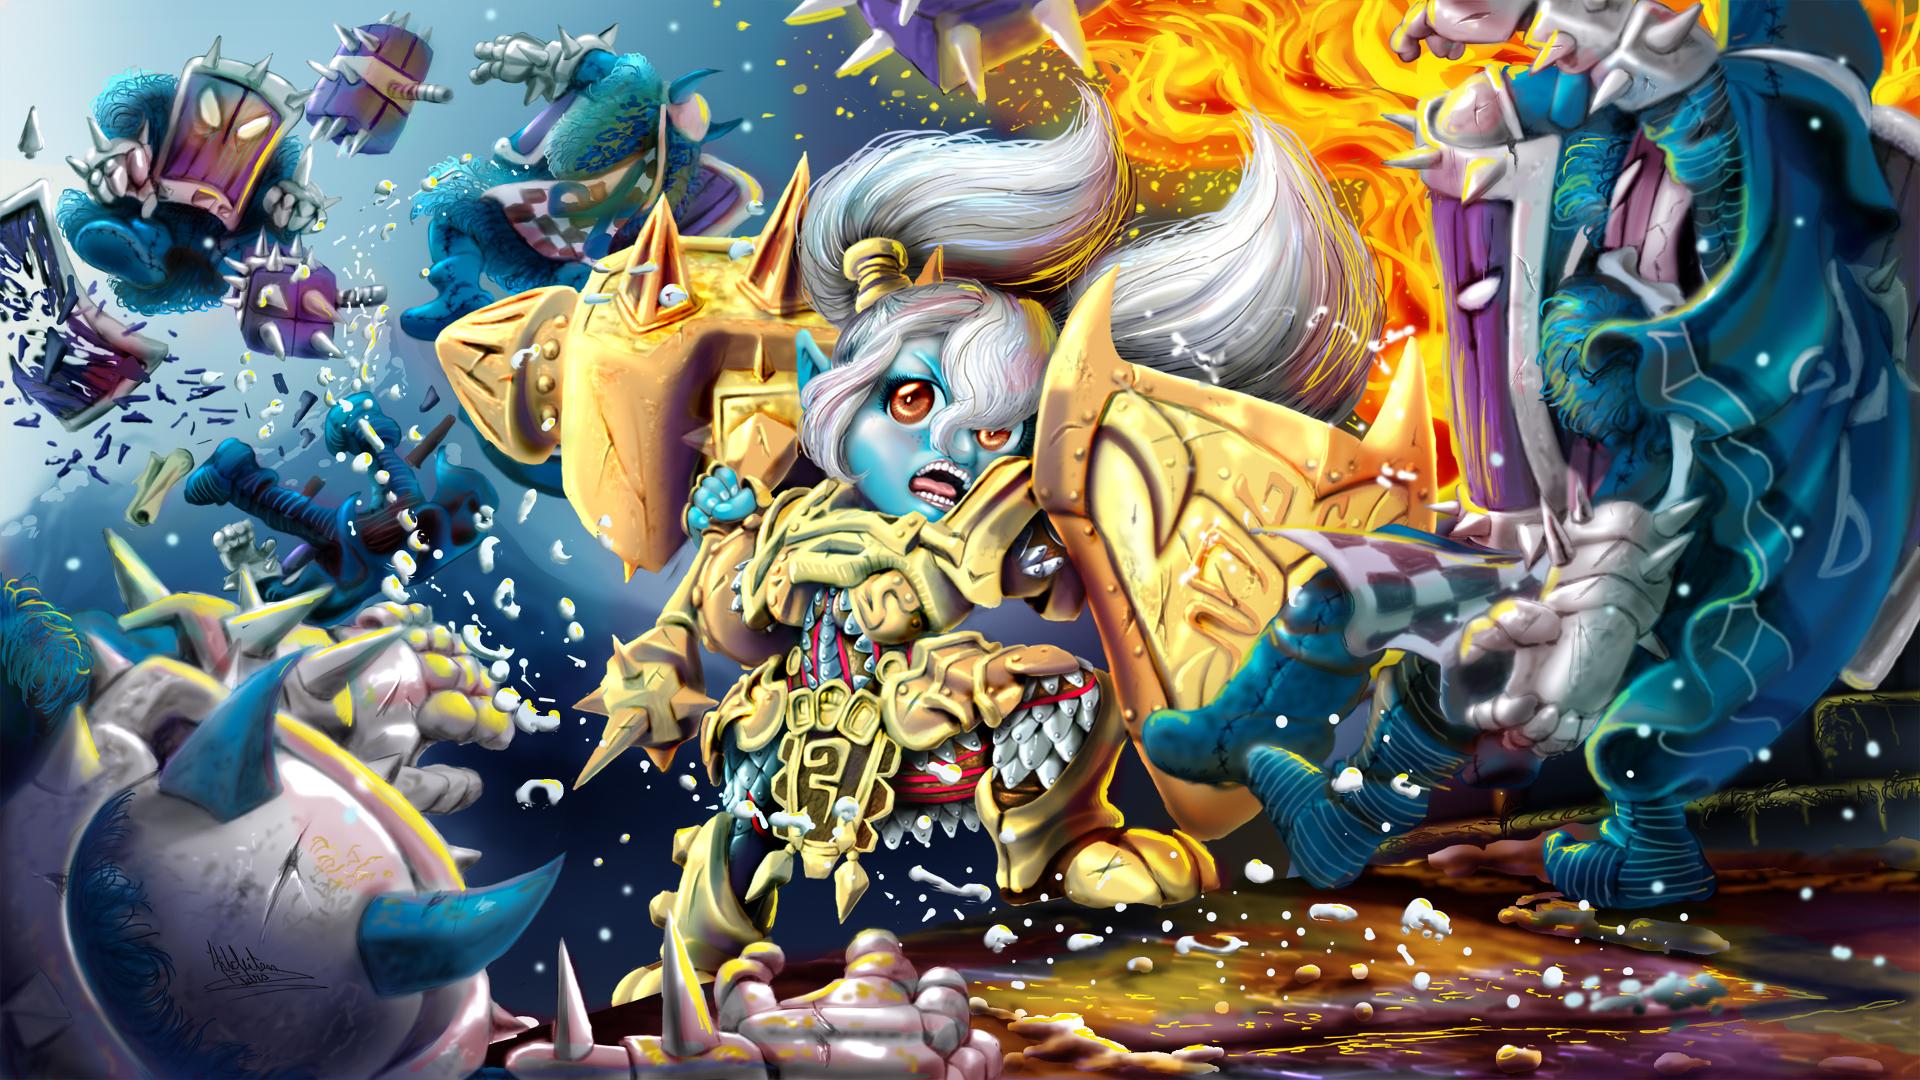 League Of Legends Poppy Wallpaper: League Of Legends HD Wallpaper